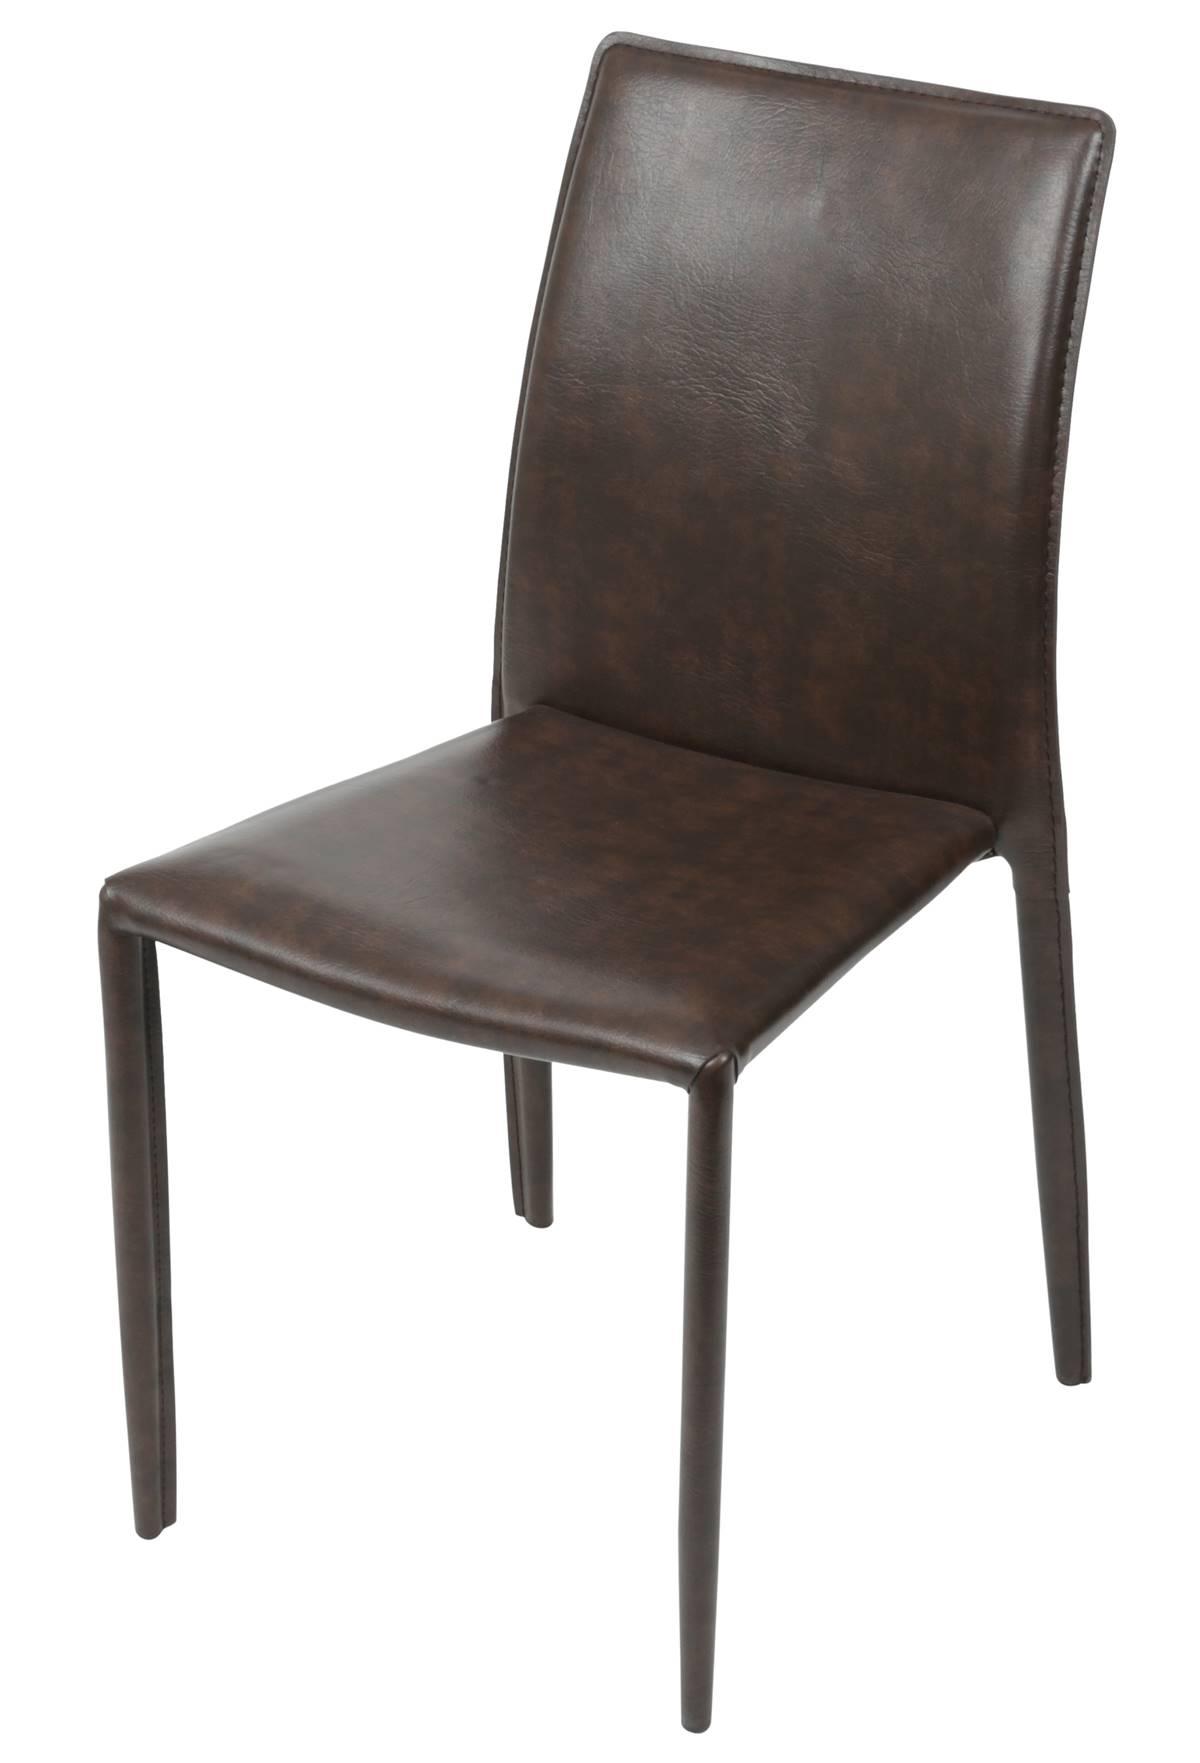 Cadeira Bali Estofada Couro Ecologico Retro - 51308